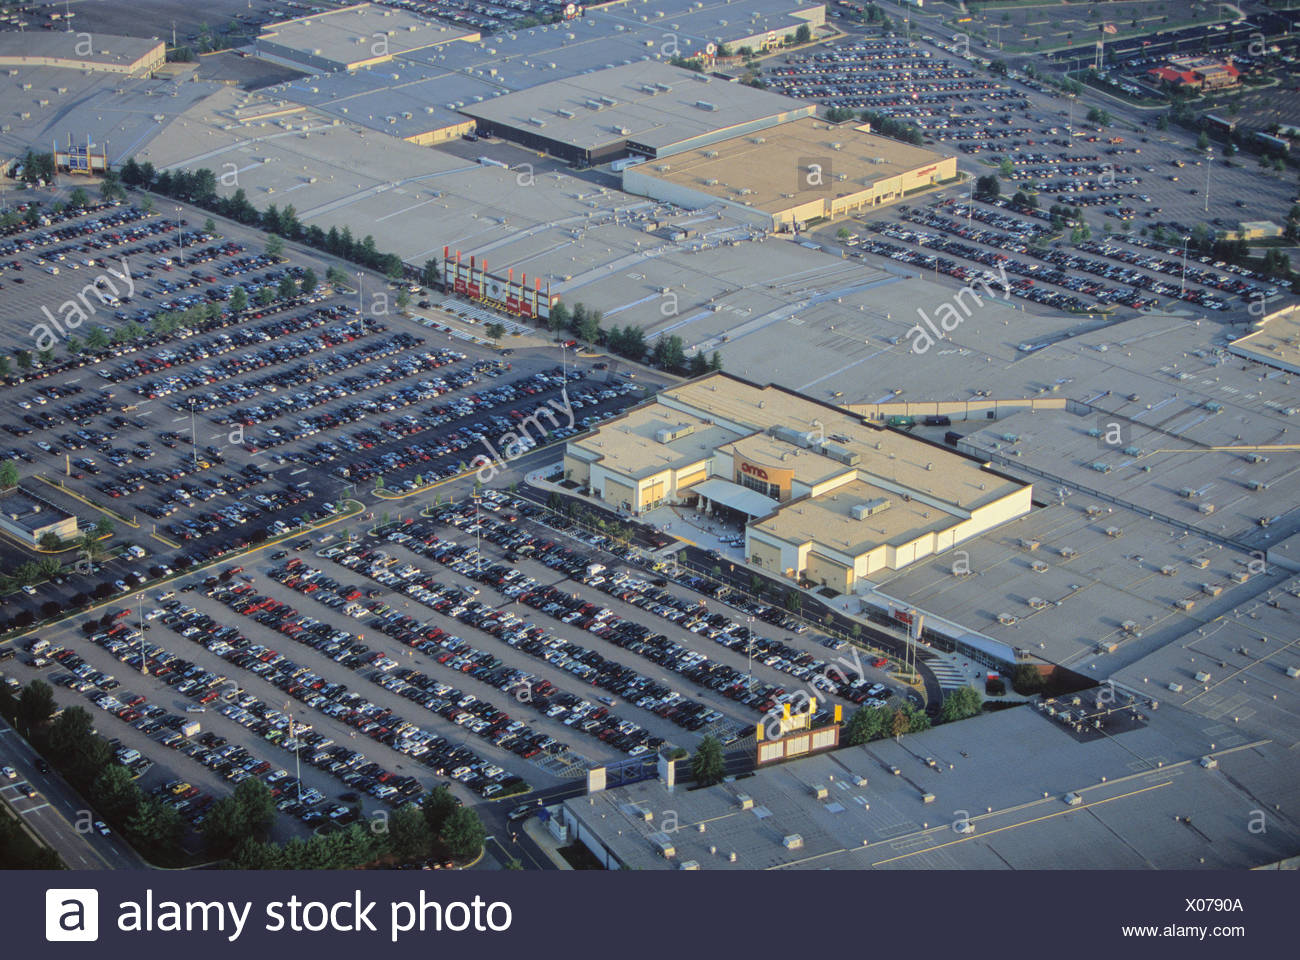 b82d0c7ca Stock Photo. Enlarge. Potomac Mills Shopping mall